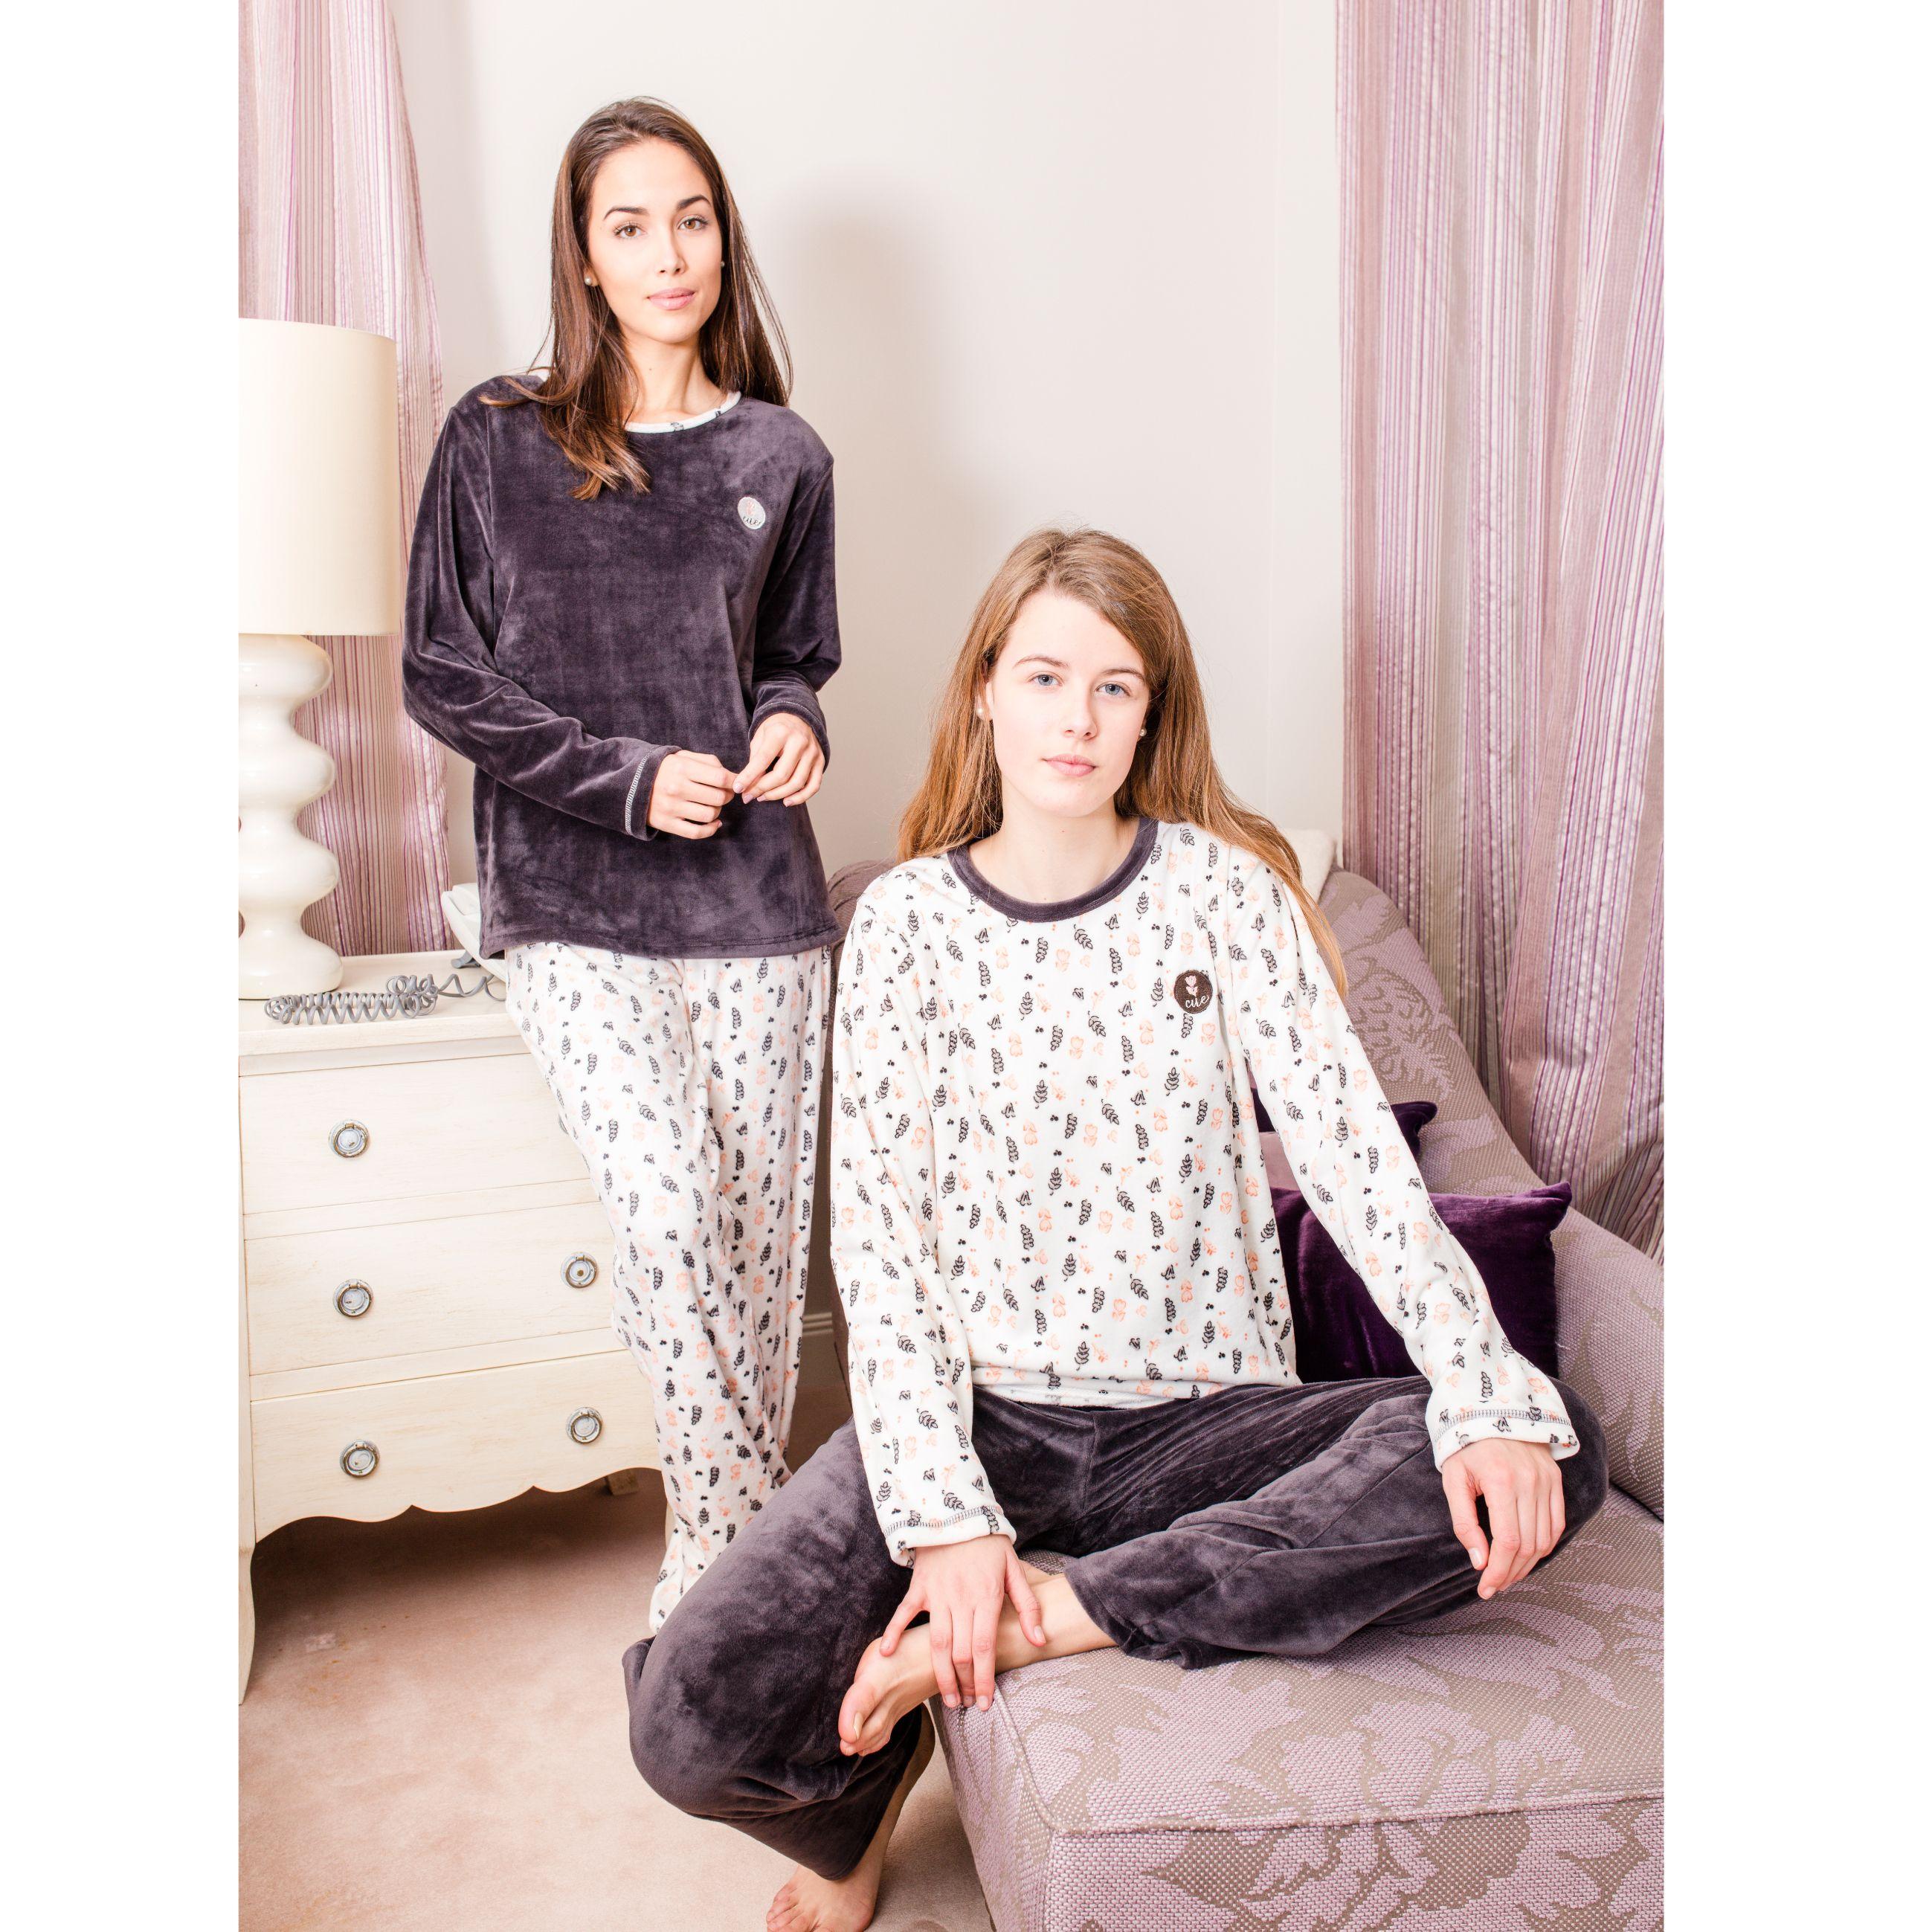 4cdf77b013125 pijama bata señora pantalon camiseta largo leggings conejo rayas azul  marino rojo marinero algodon robe pajama rabbit homewear sleepwear invierno  winter ...